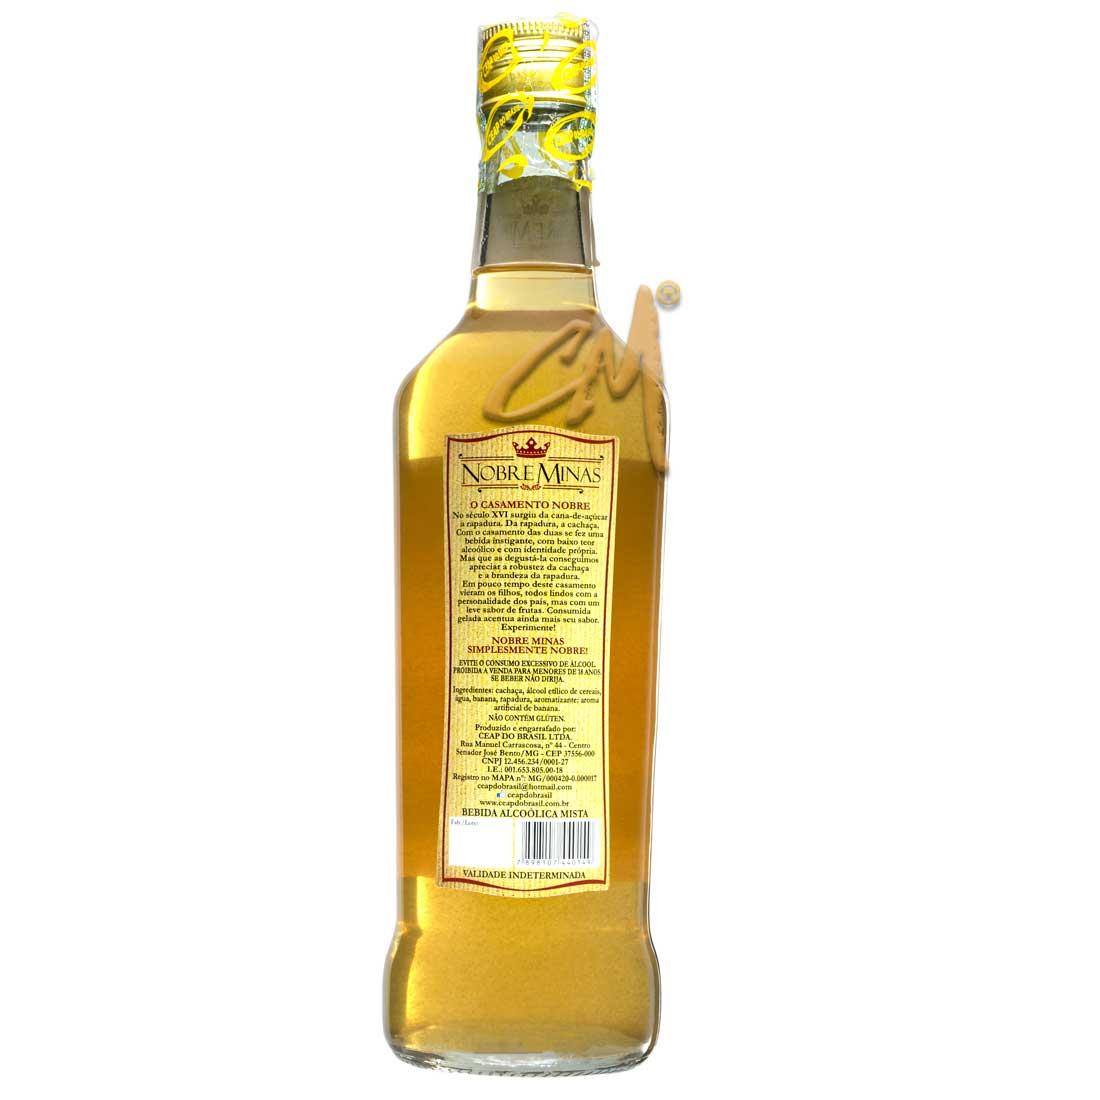 Bebida Mista Rapadura Banana Nobre Minas 670 ml (Sen. José Bento - MG)